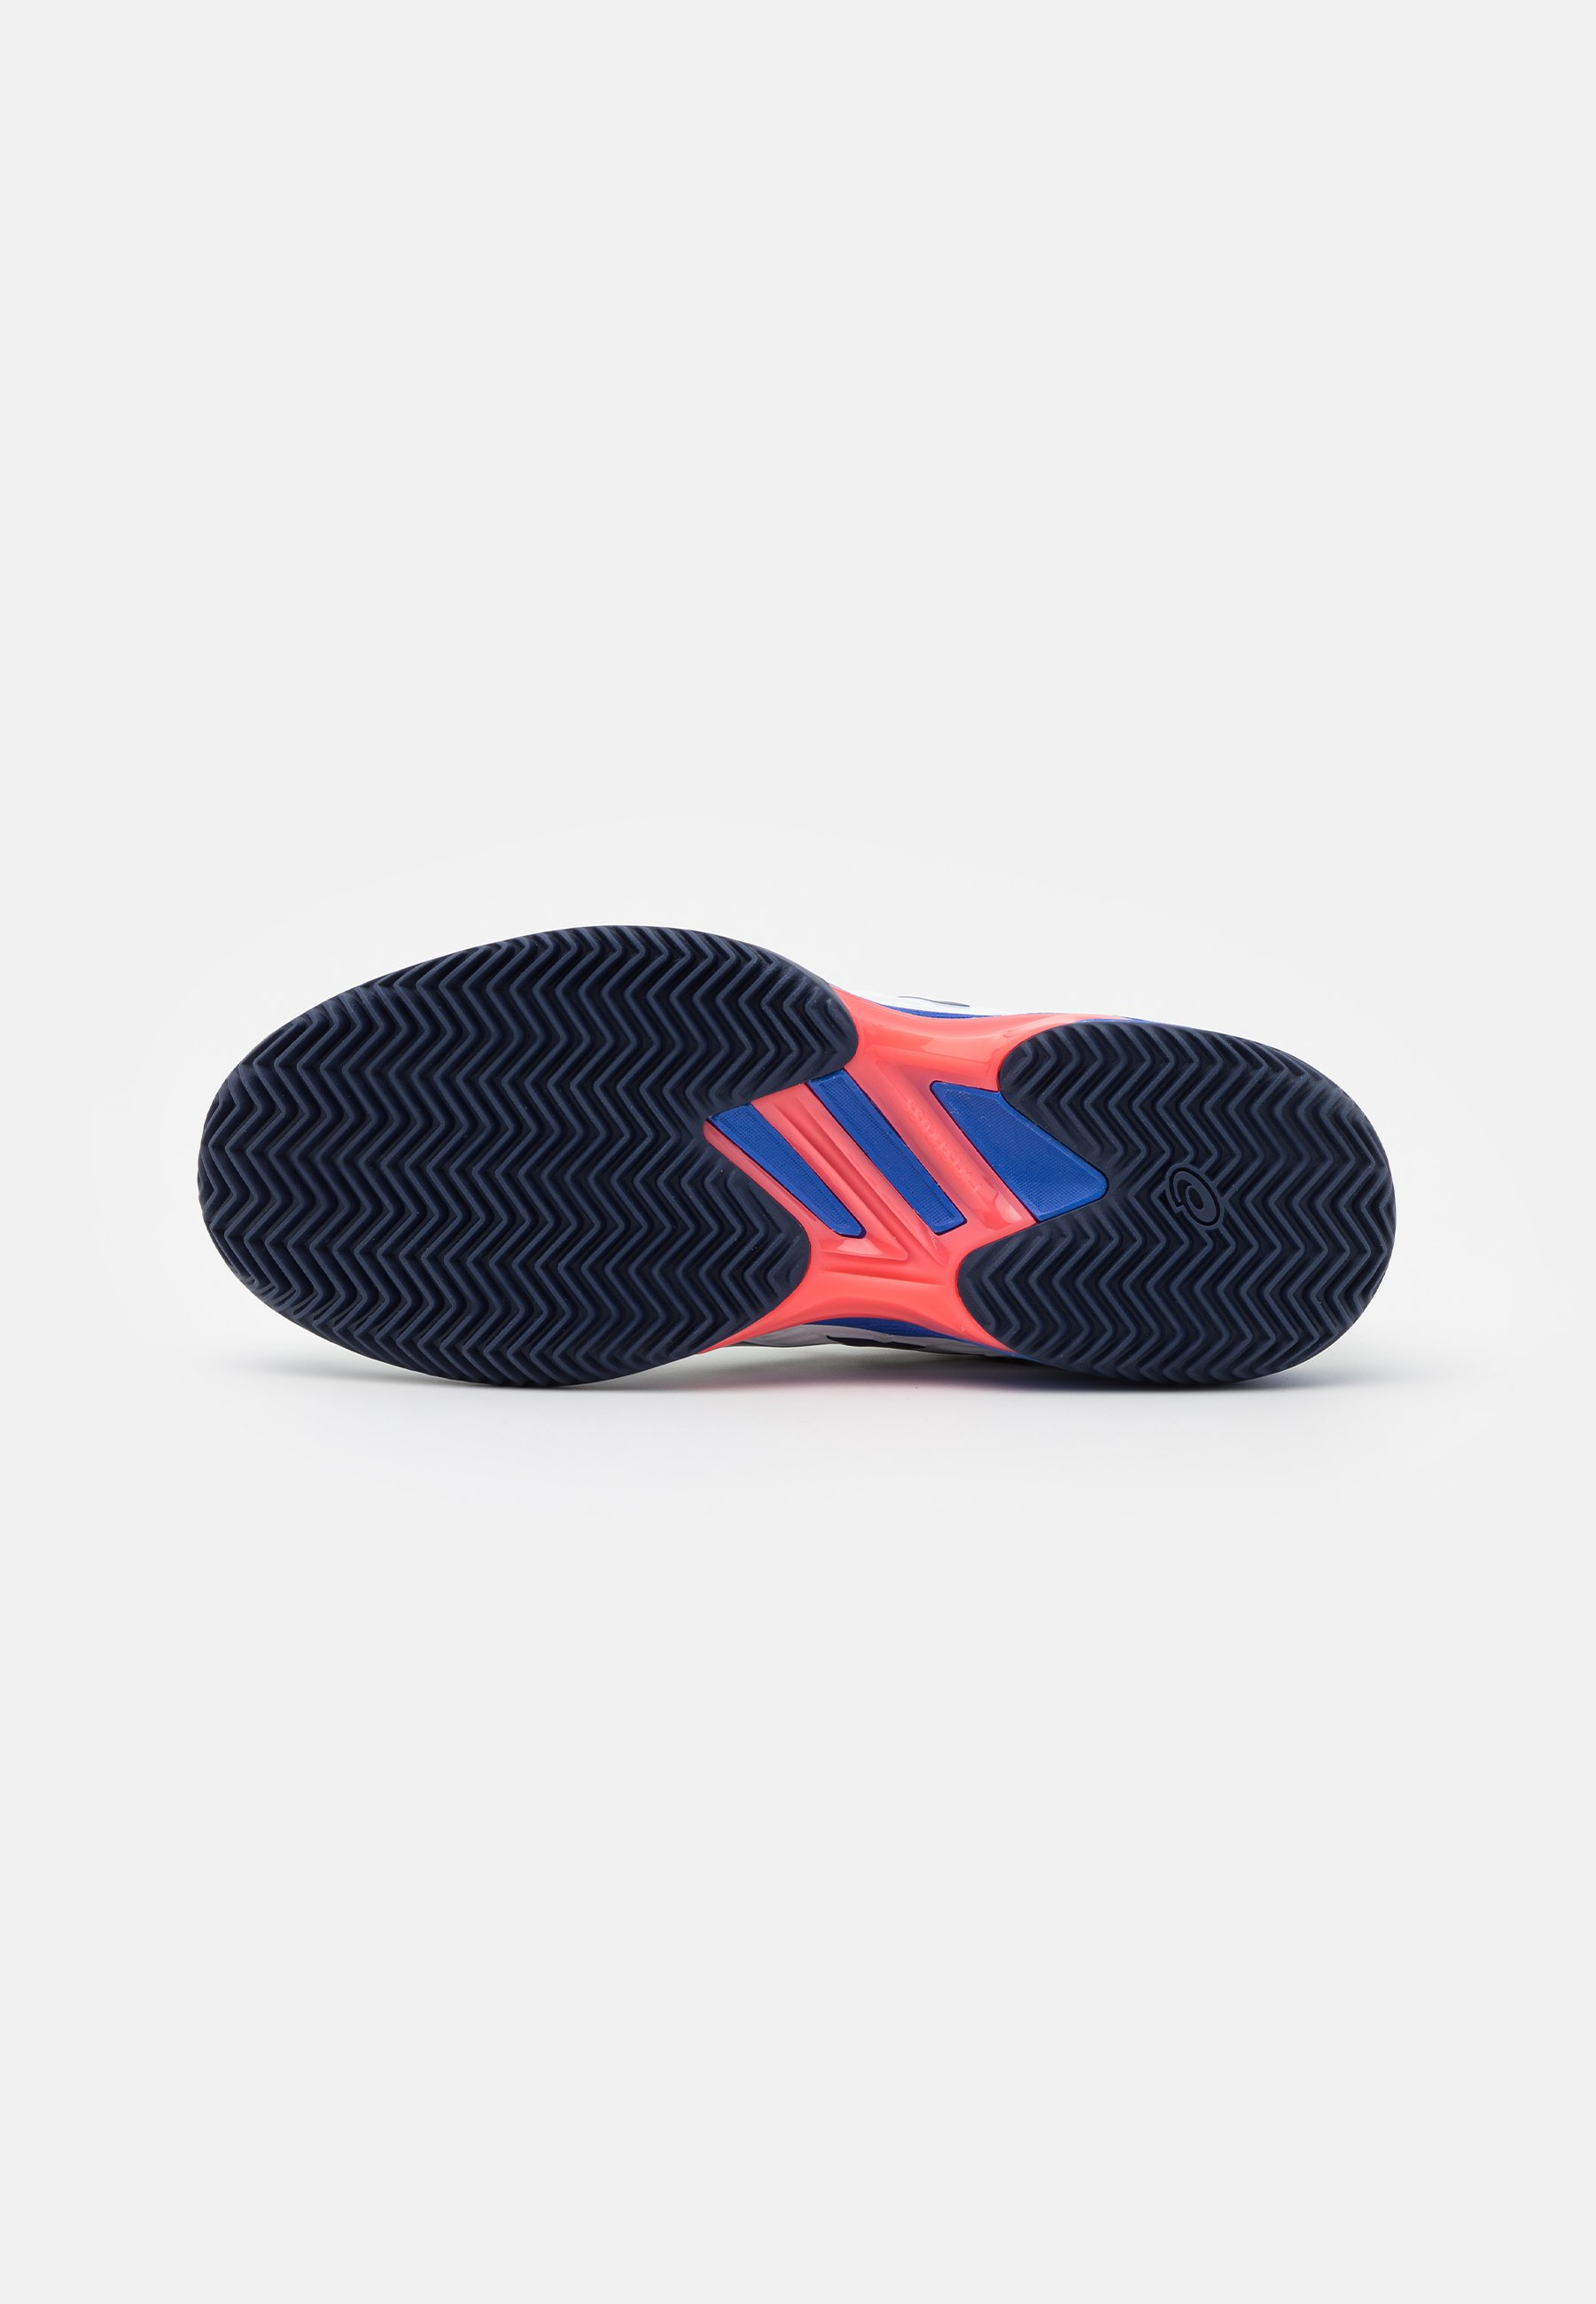 Femme SOLUTION SPEED FF CLAY - Chaussures de tennis pour terre-battueerre battue